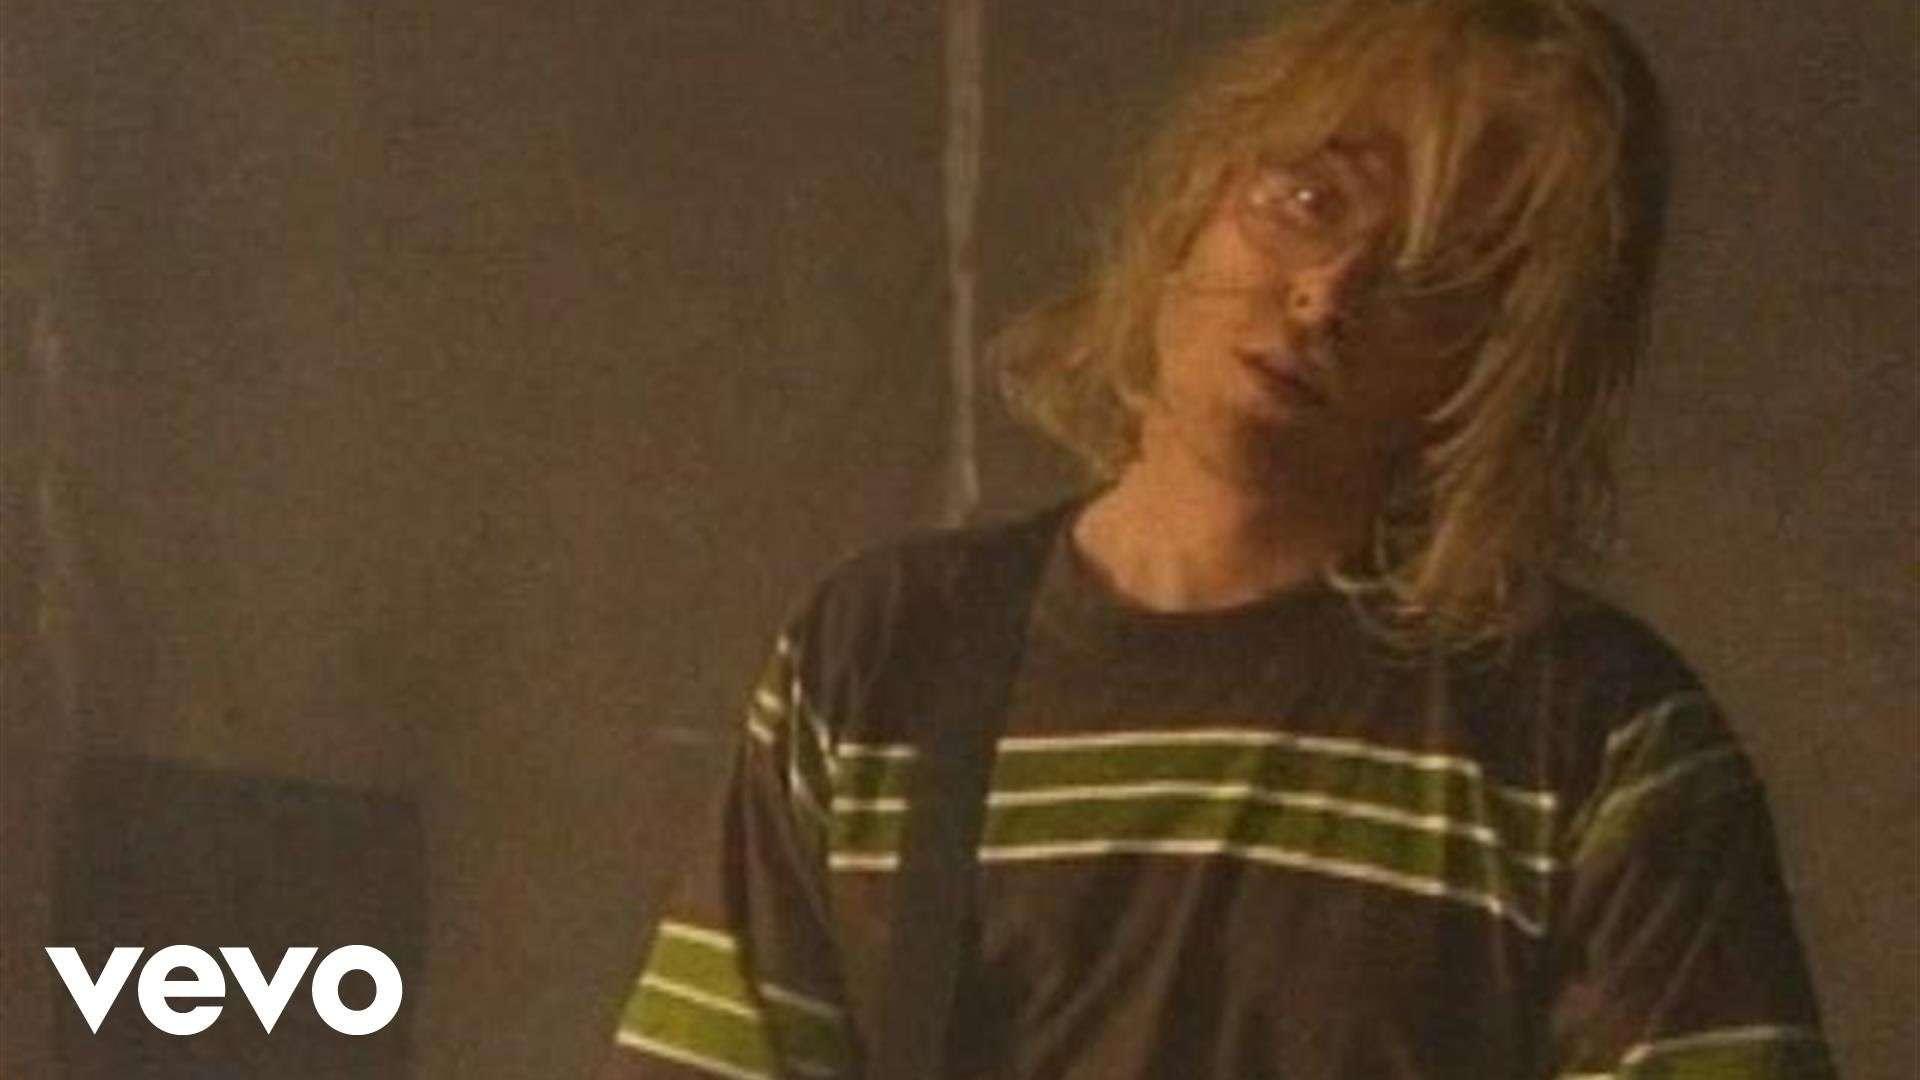 """Weird Al"" Yankovic - Smells Like Nirvana - YouTube"